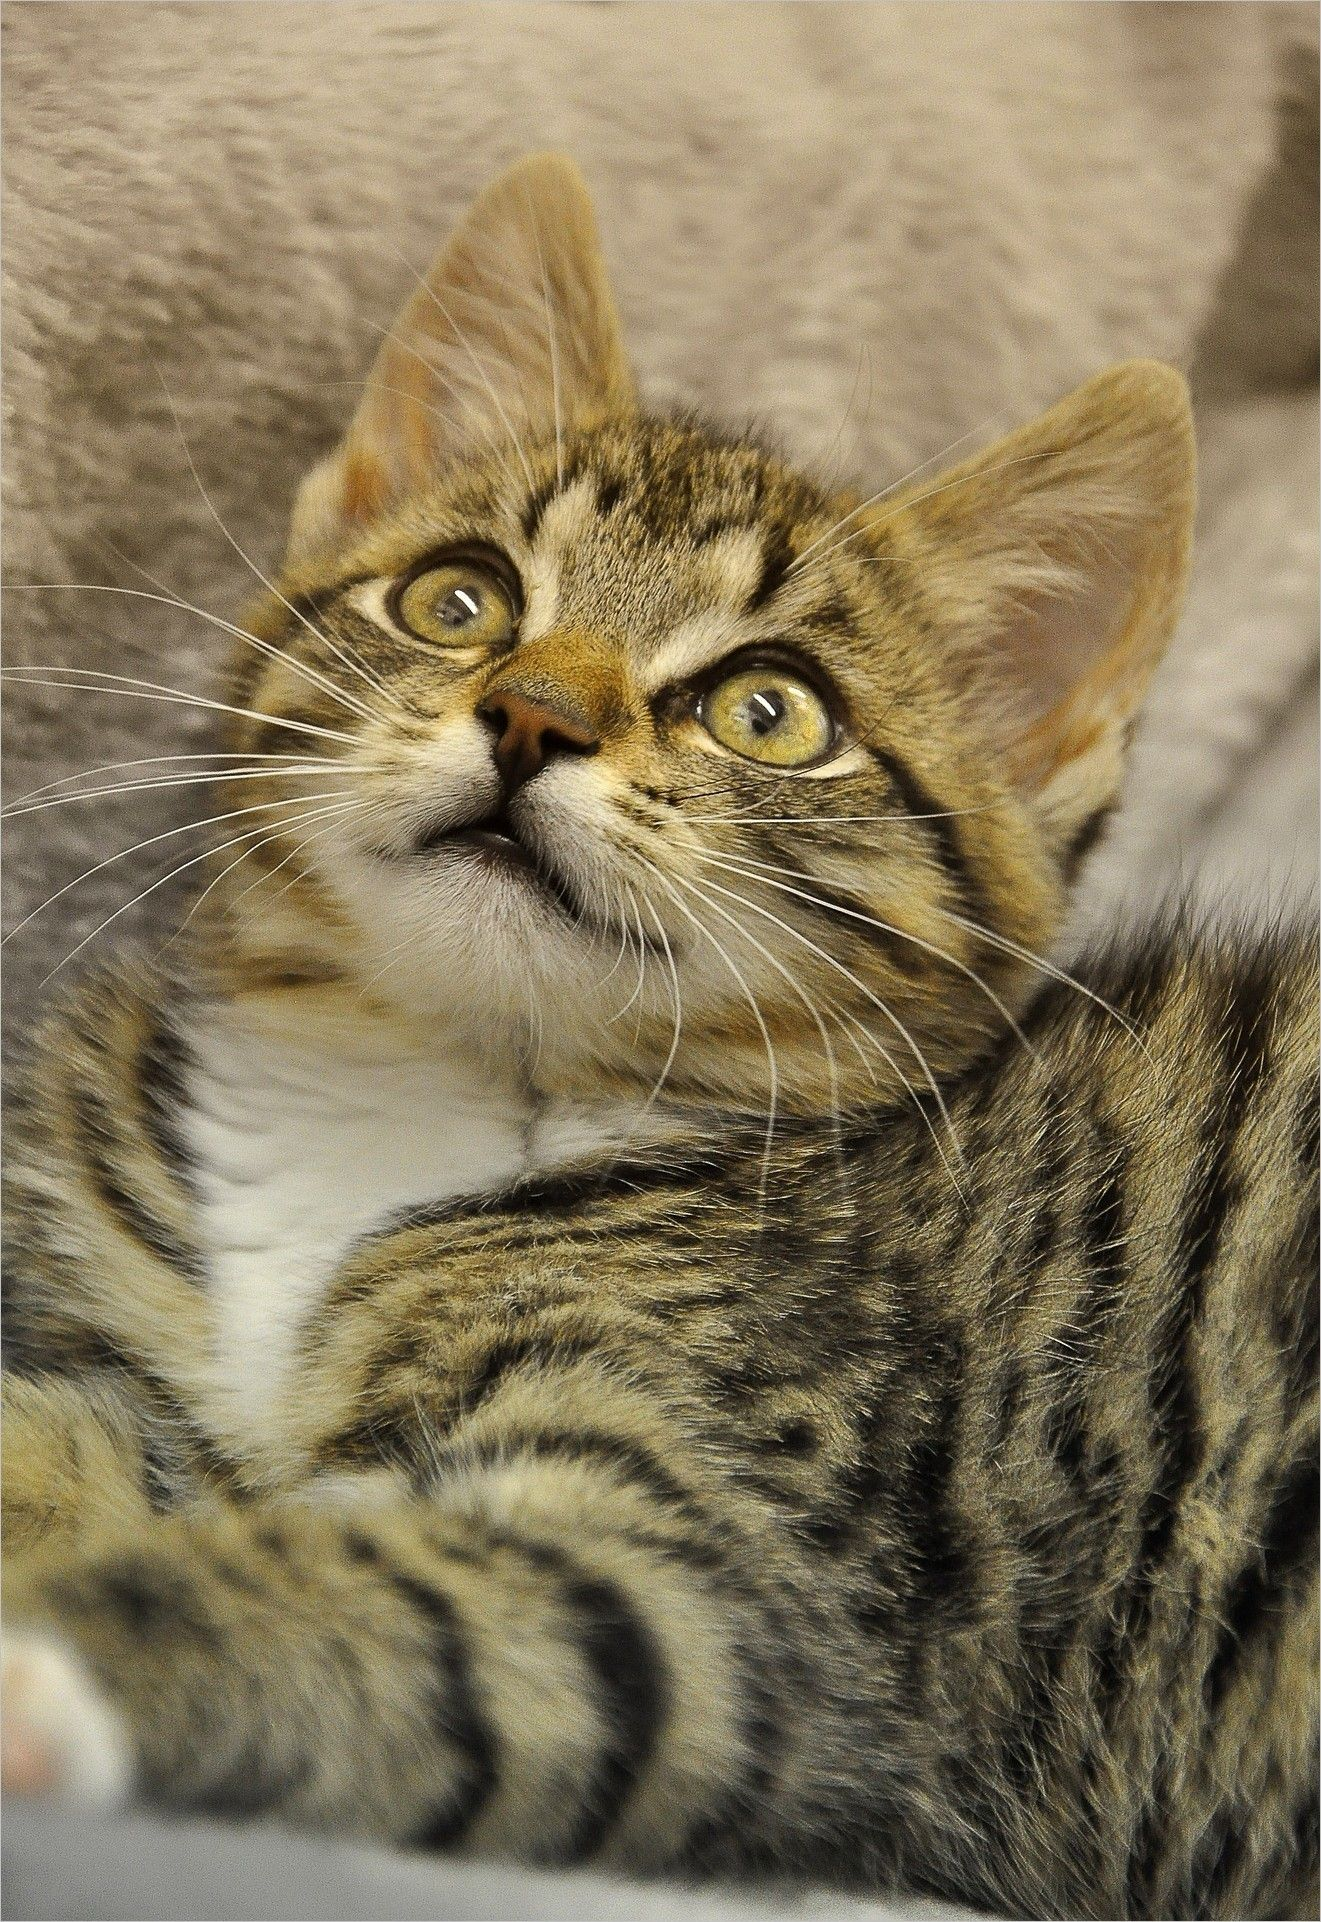 Cat Pictures img Cat Eyes cat mieze mackerel pet hangover